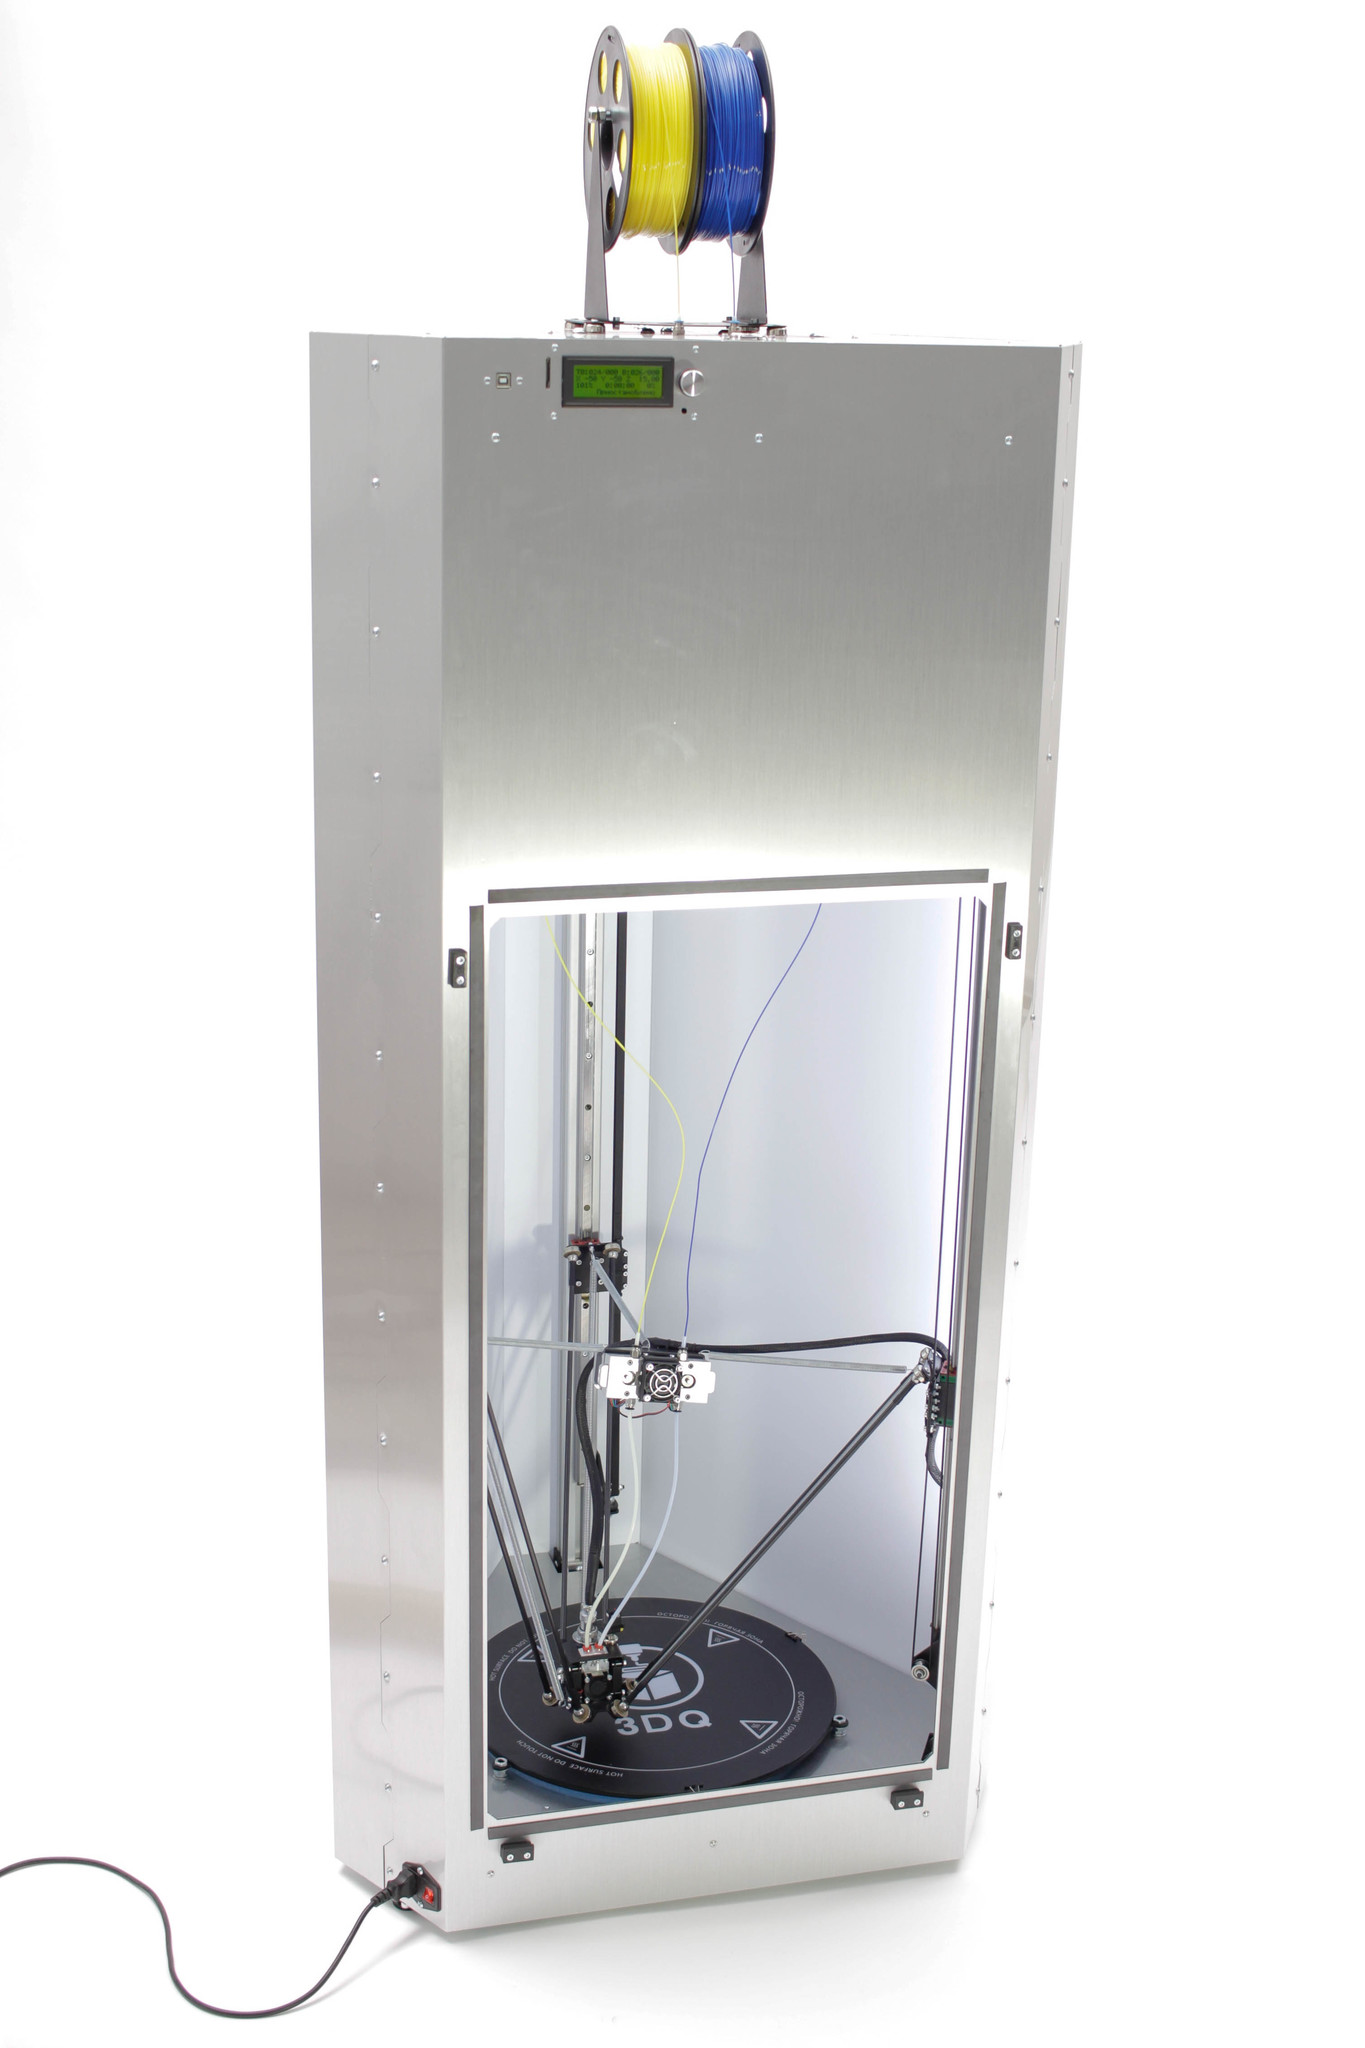 3D принтер Prism Pro Dual